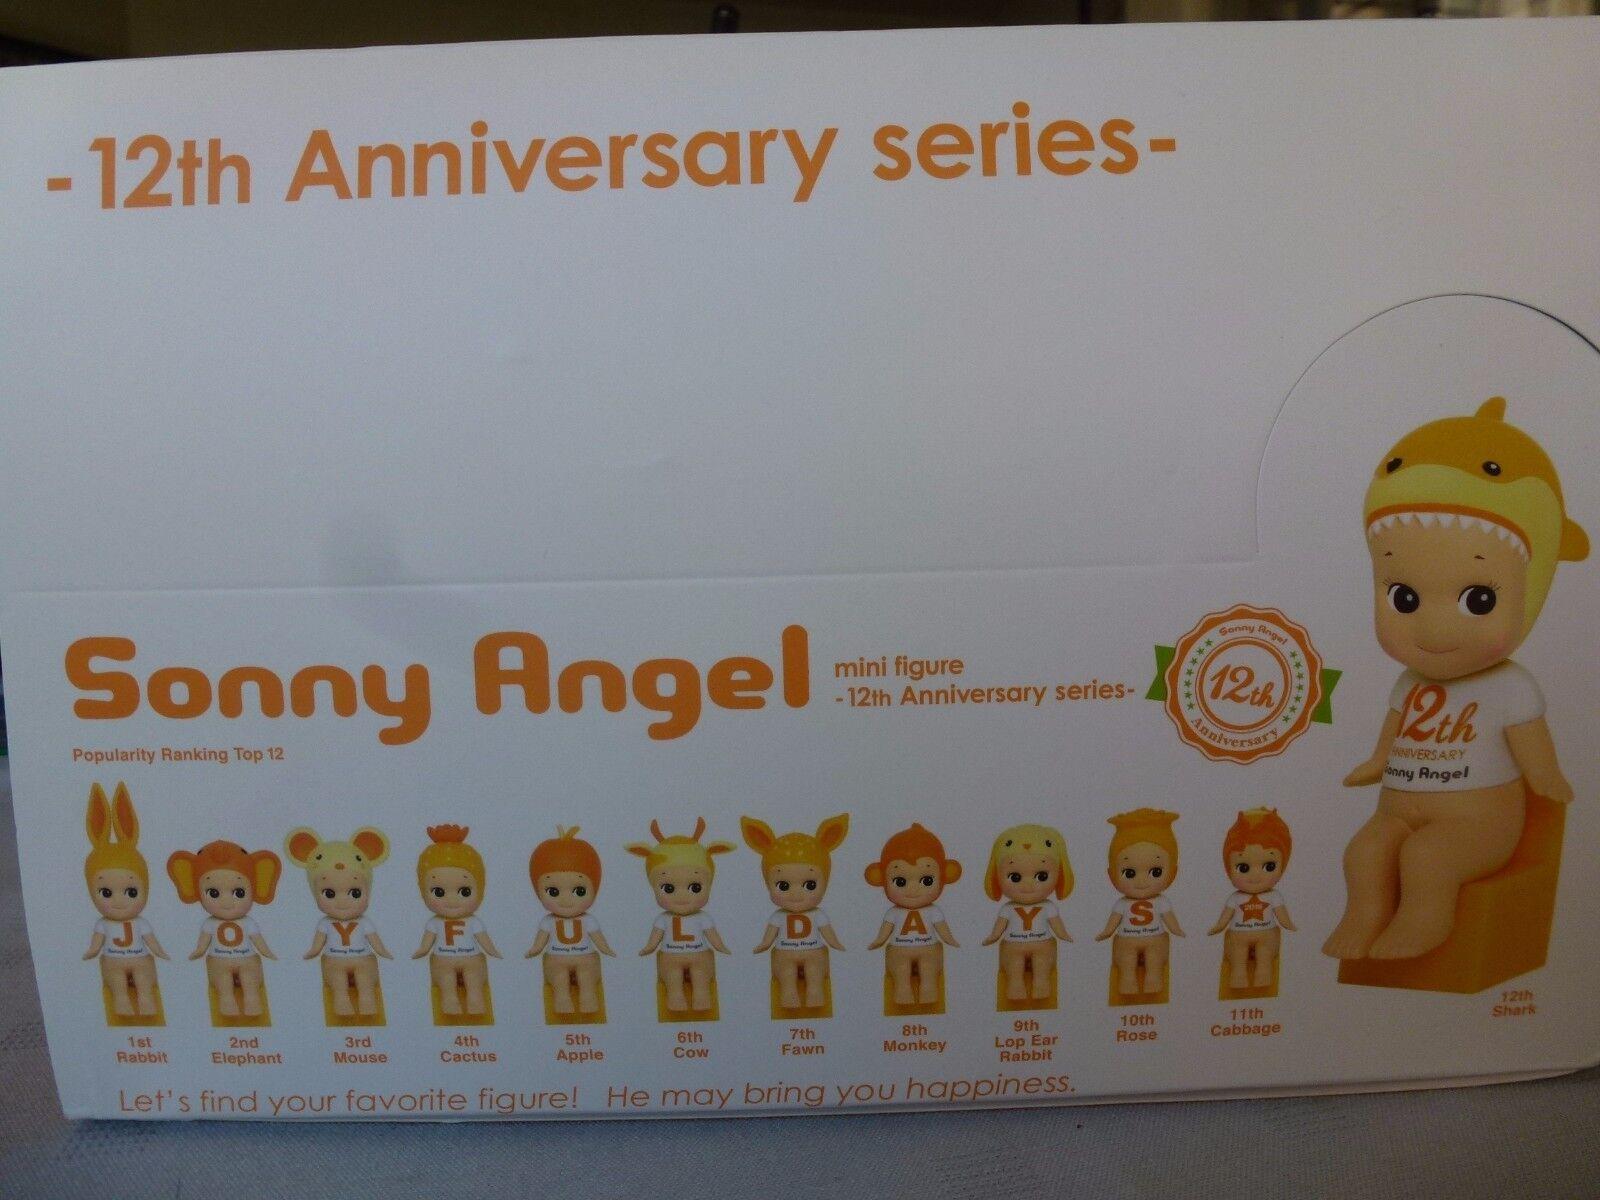 SONNY ANGEL full série complète 12   12 th anniversary 2016  ltd edition